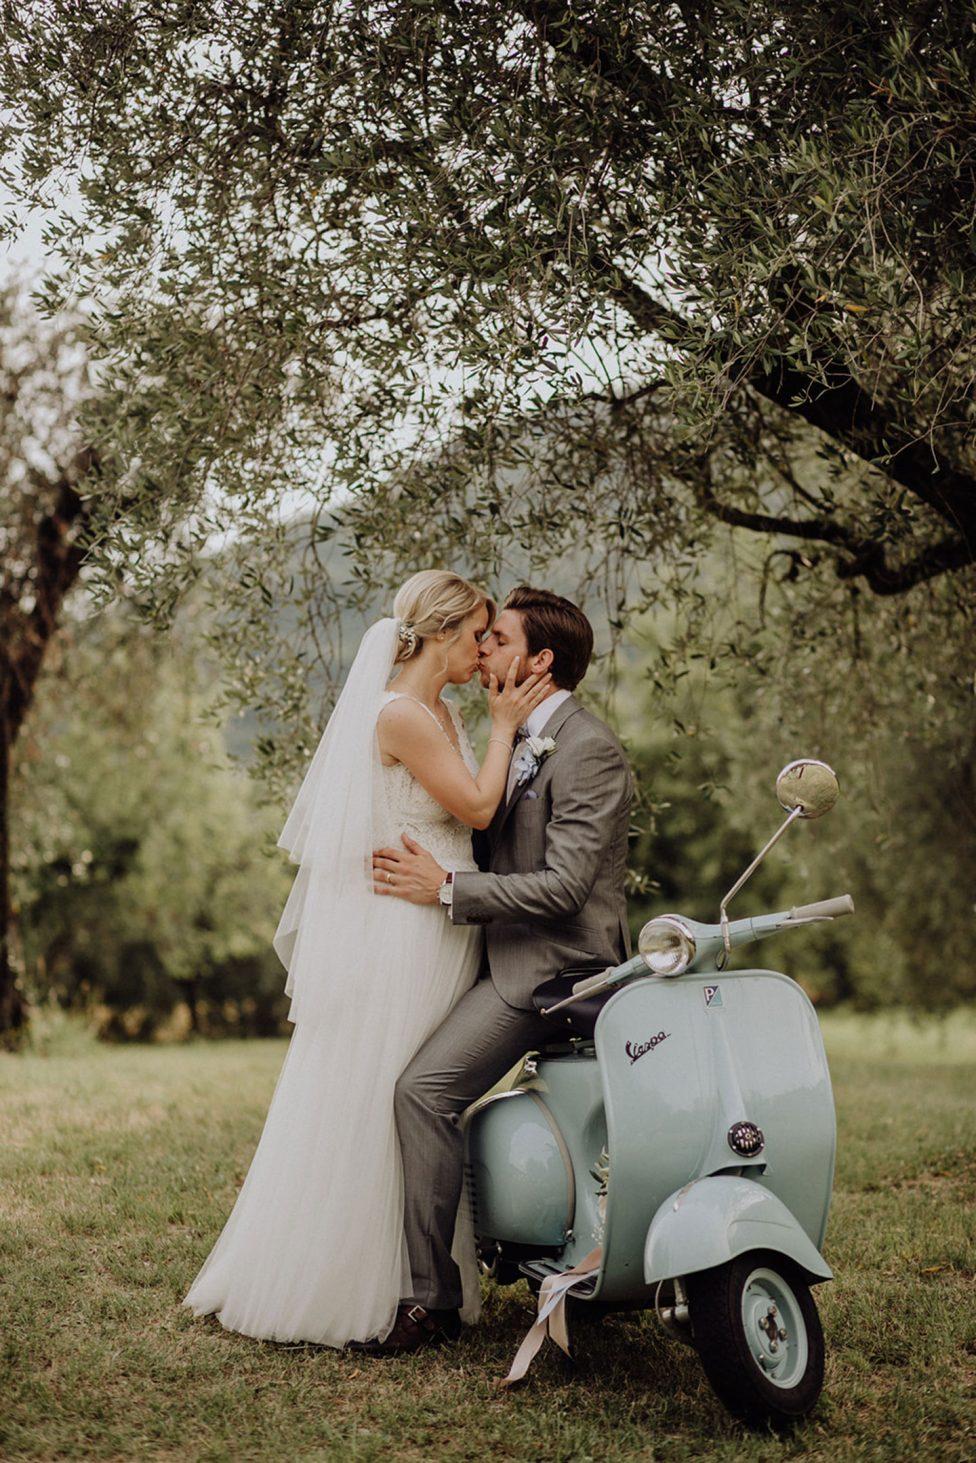 Linda & Marcel: Viaggio d'amore nach Italien